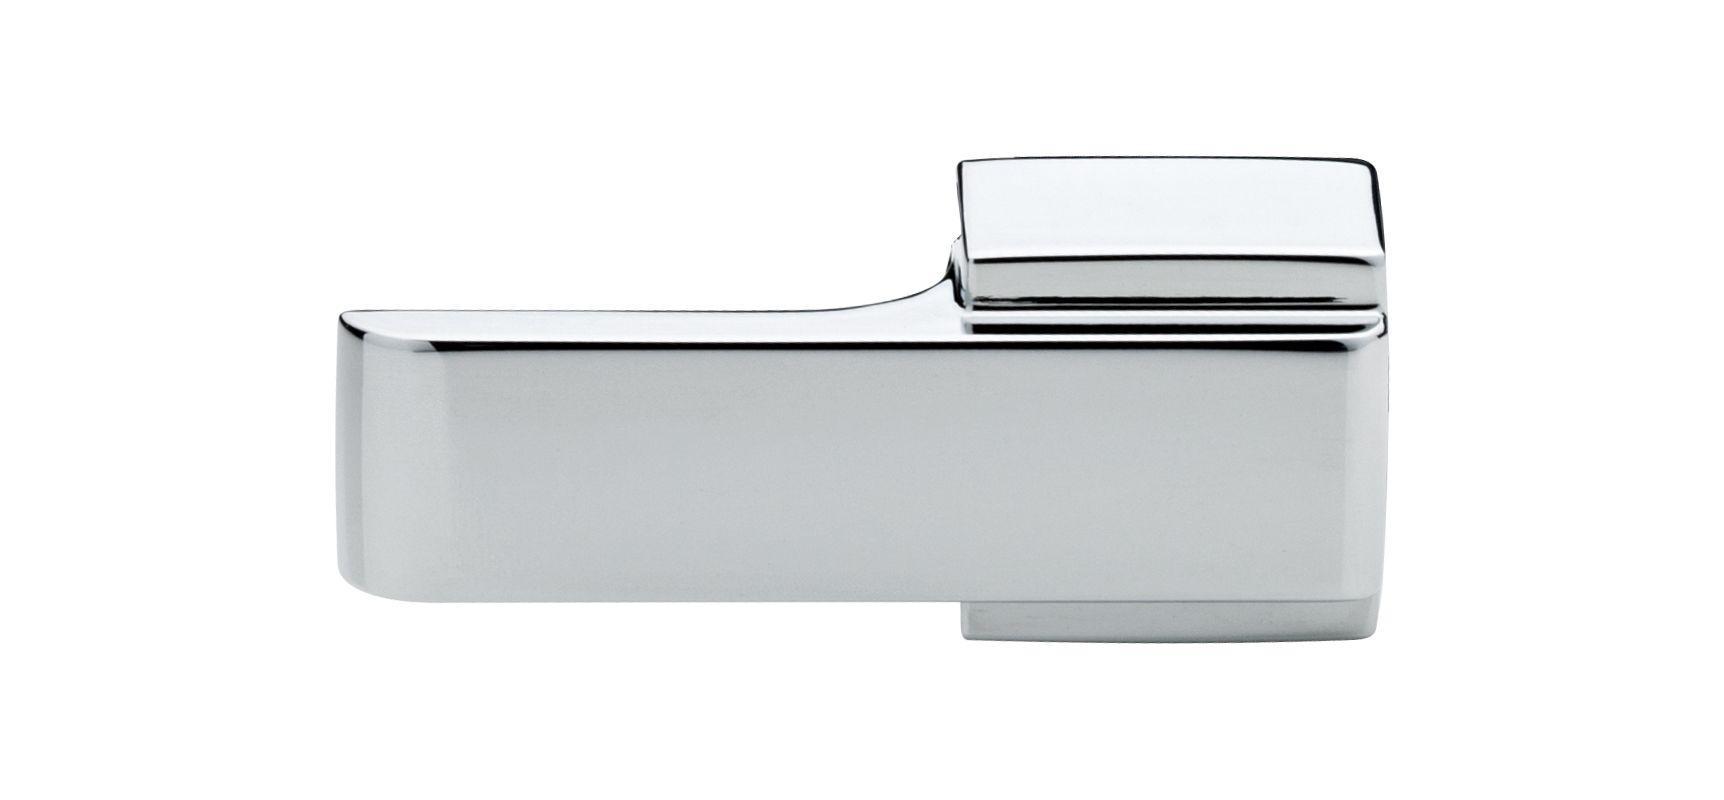 Delta 77560 Chrome Ara Side Tank Lever Faucetdirect Com